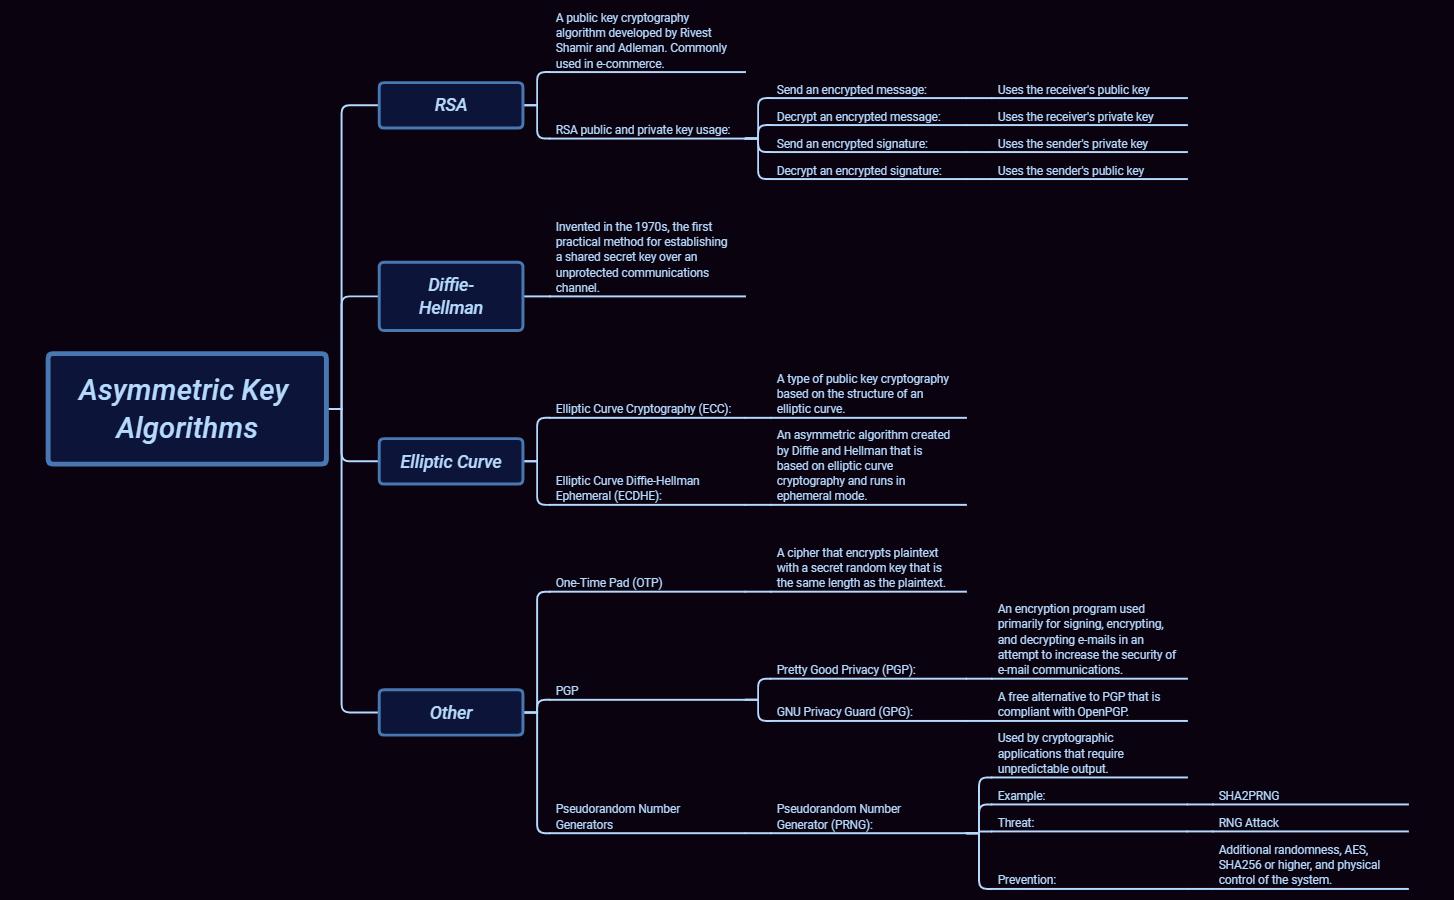 6 2 3 Asymmetric Key Algorithms - XMind - Mind Mapping Software